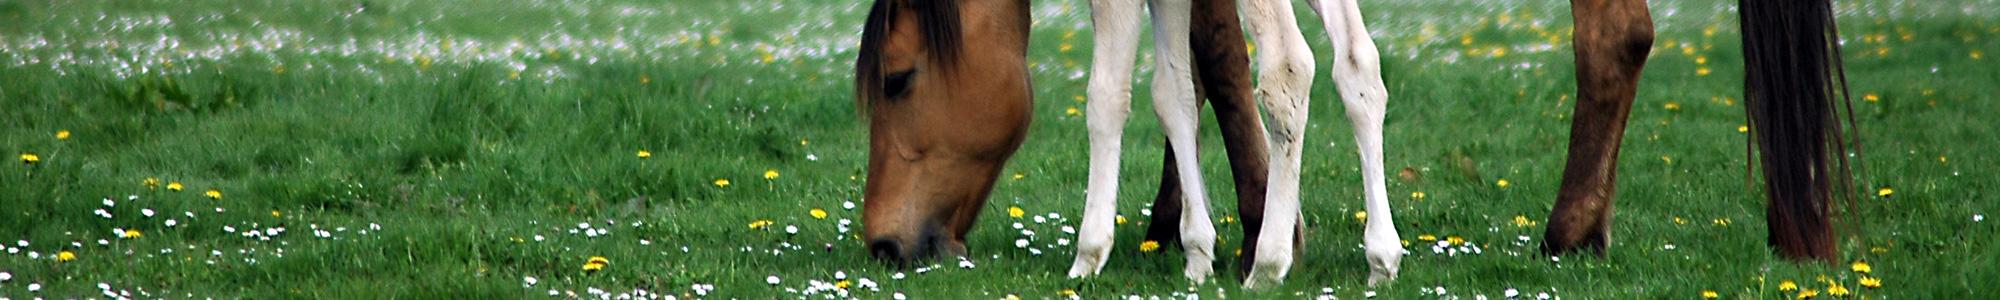 Promocje - Art-horse Sklep jeździecki